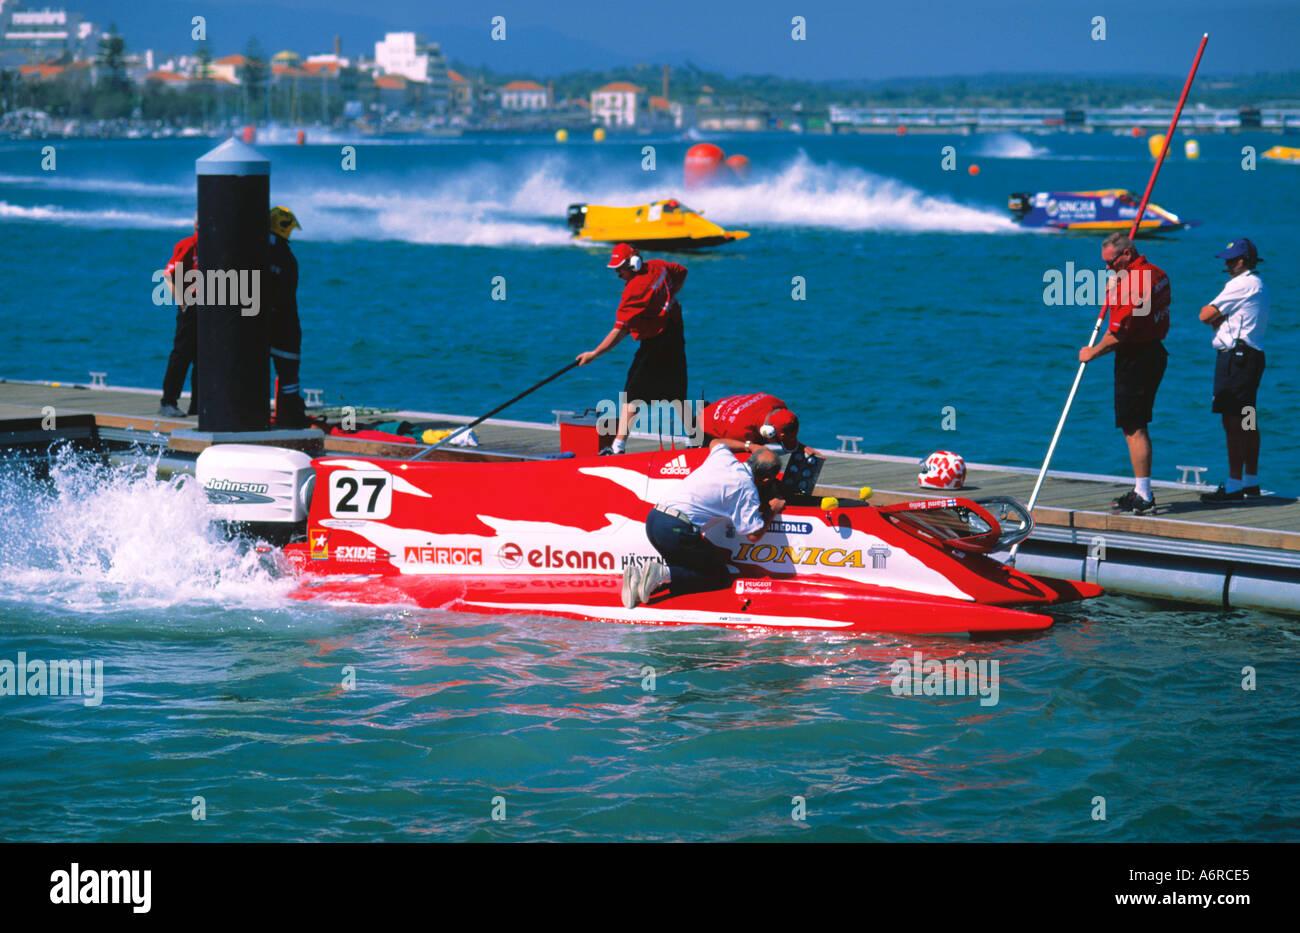 Speedboat Formule One Portimao Algarve Portugal - Stock Image